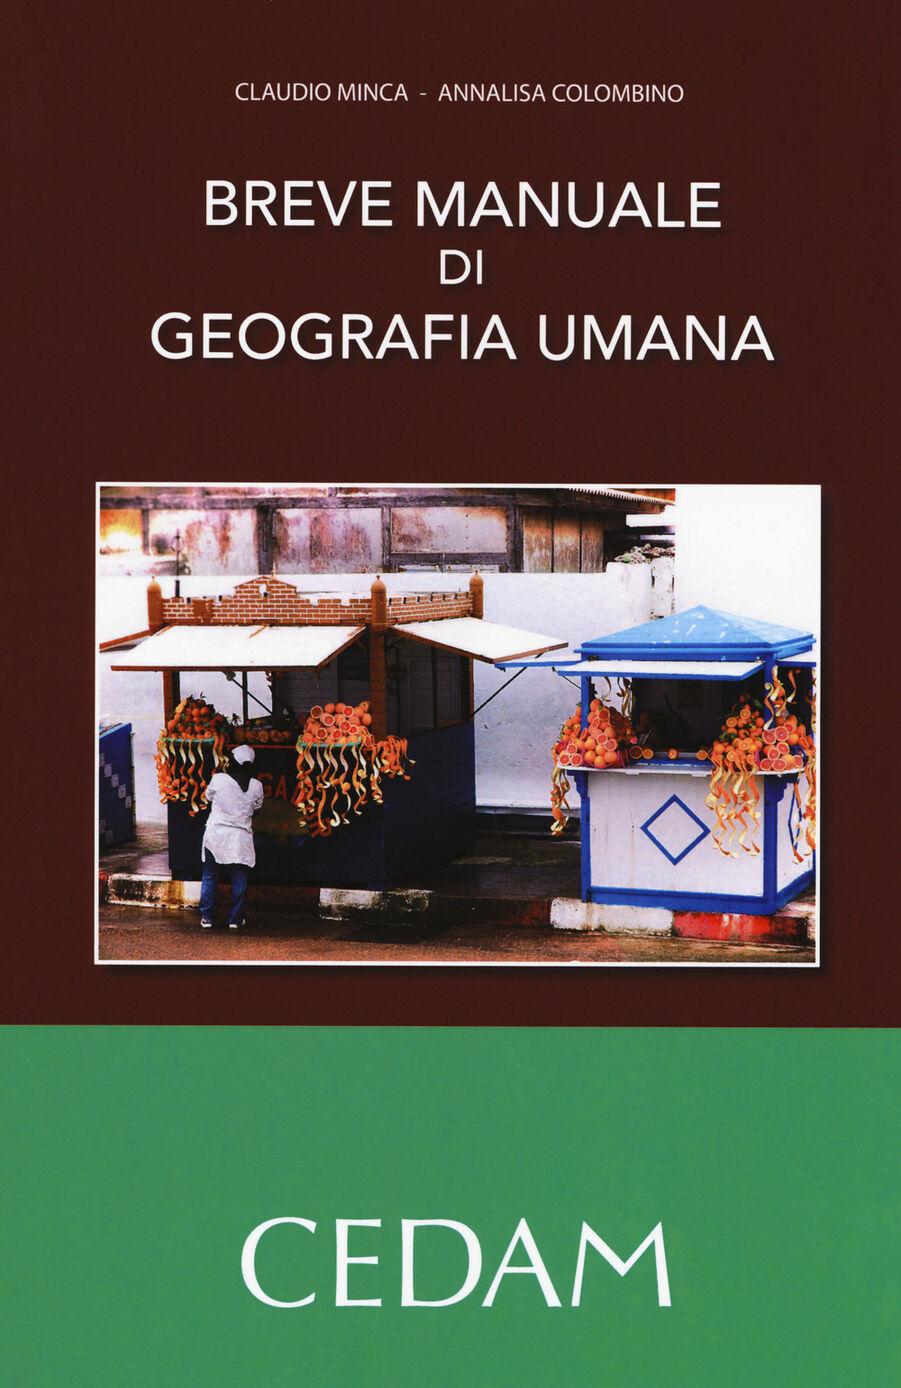 Breve manuale di geografia umana